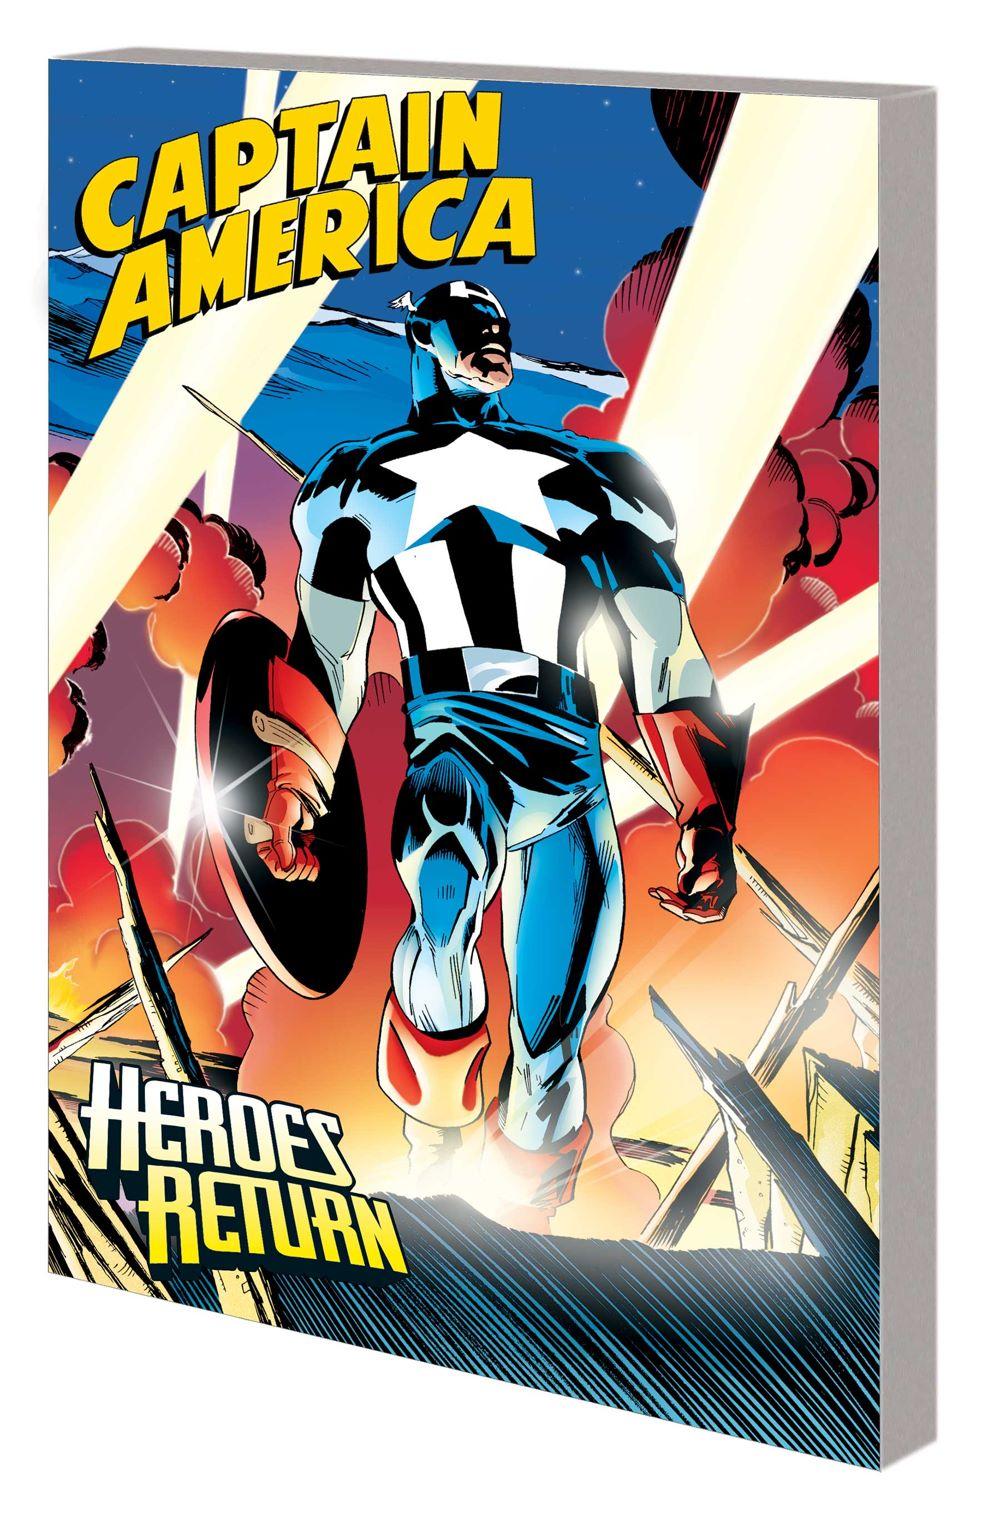 CAPAHR_CC_V1_TPB Marvel Comics January 2021 Solicitations